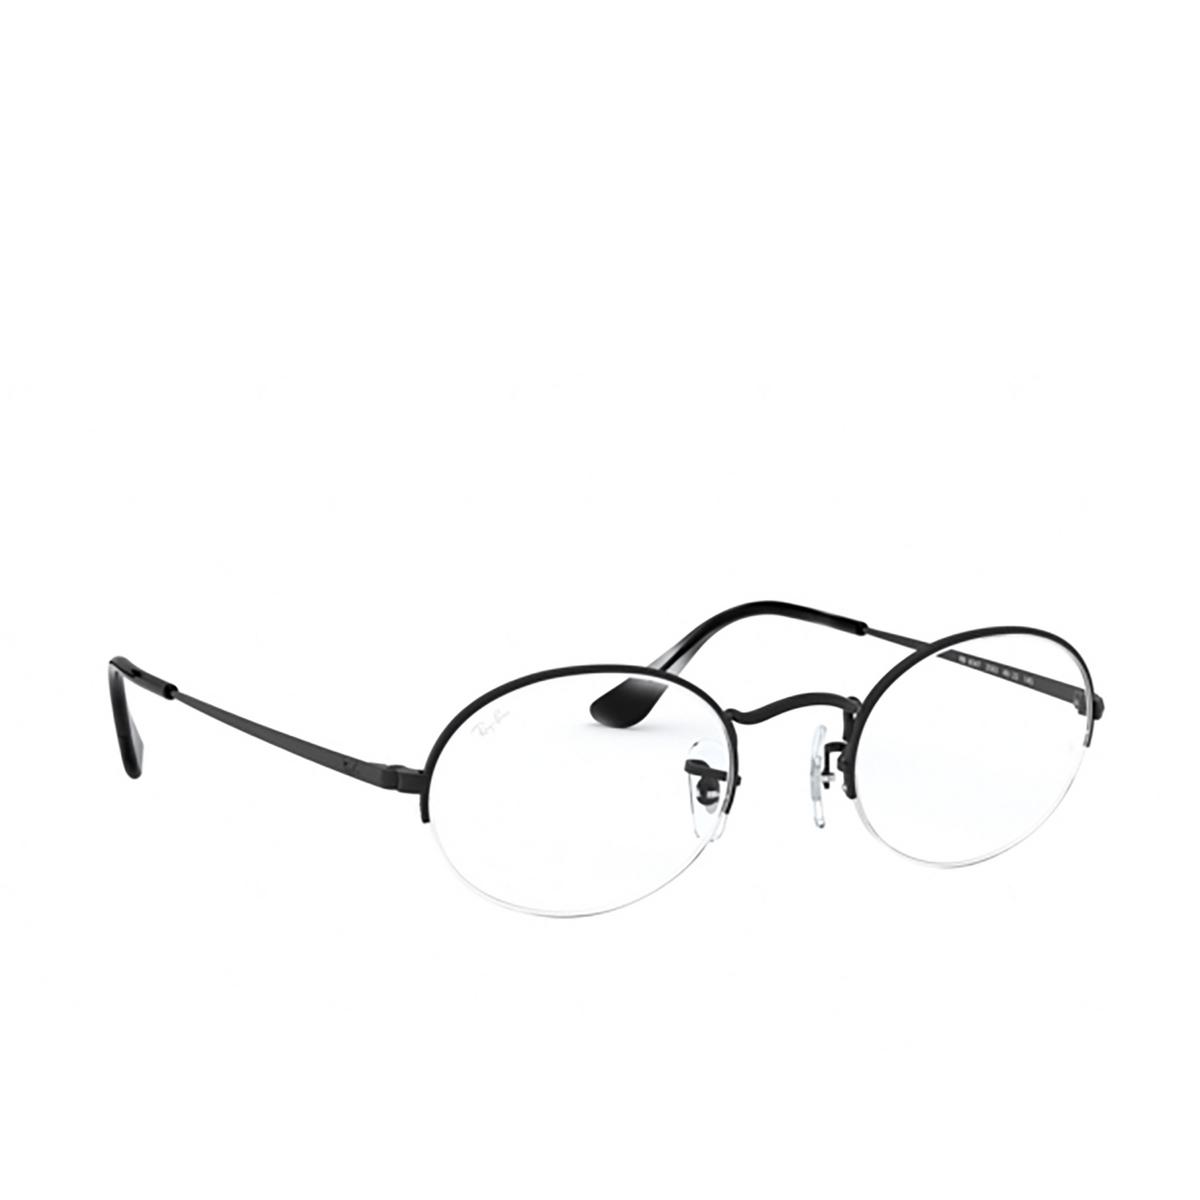 Ray-Ban® Oval Eyeglasses: Oval Gaze RX6547 color Matte Black 2503 - three-quarters view.